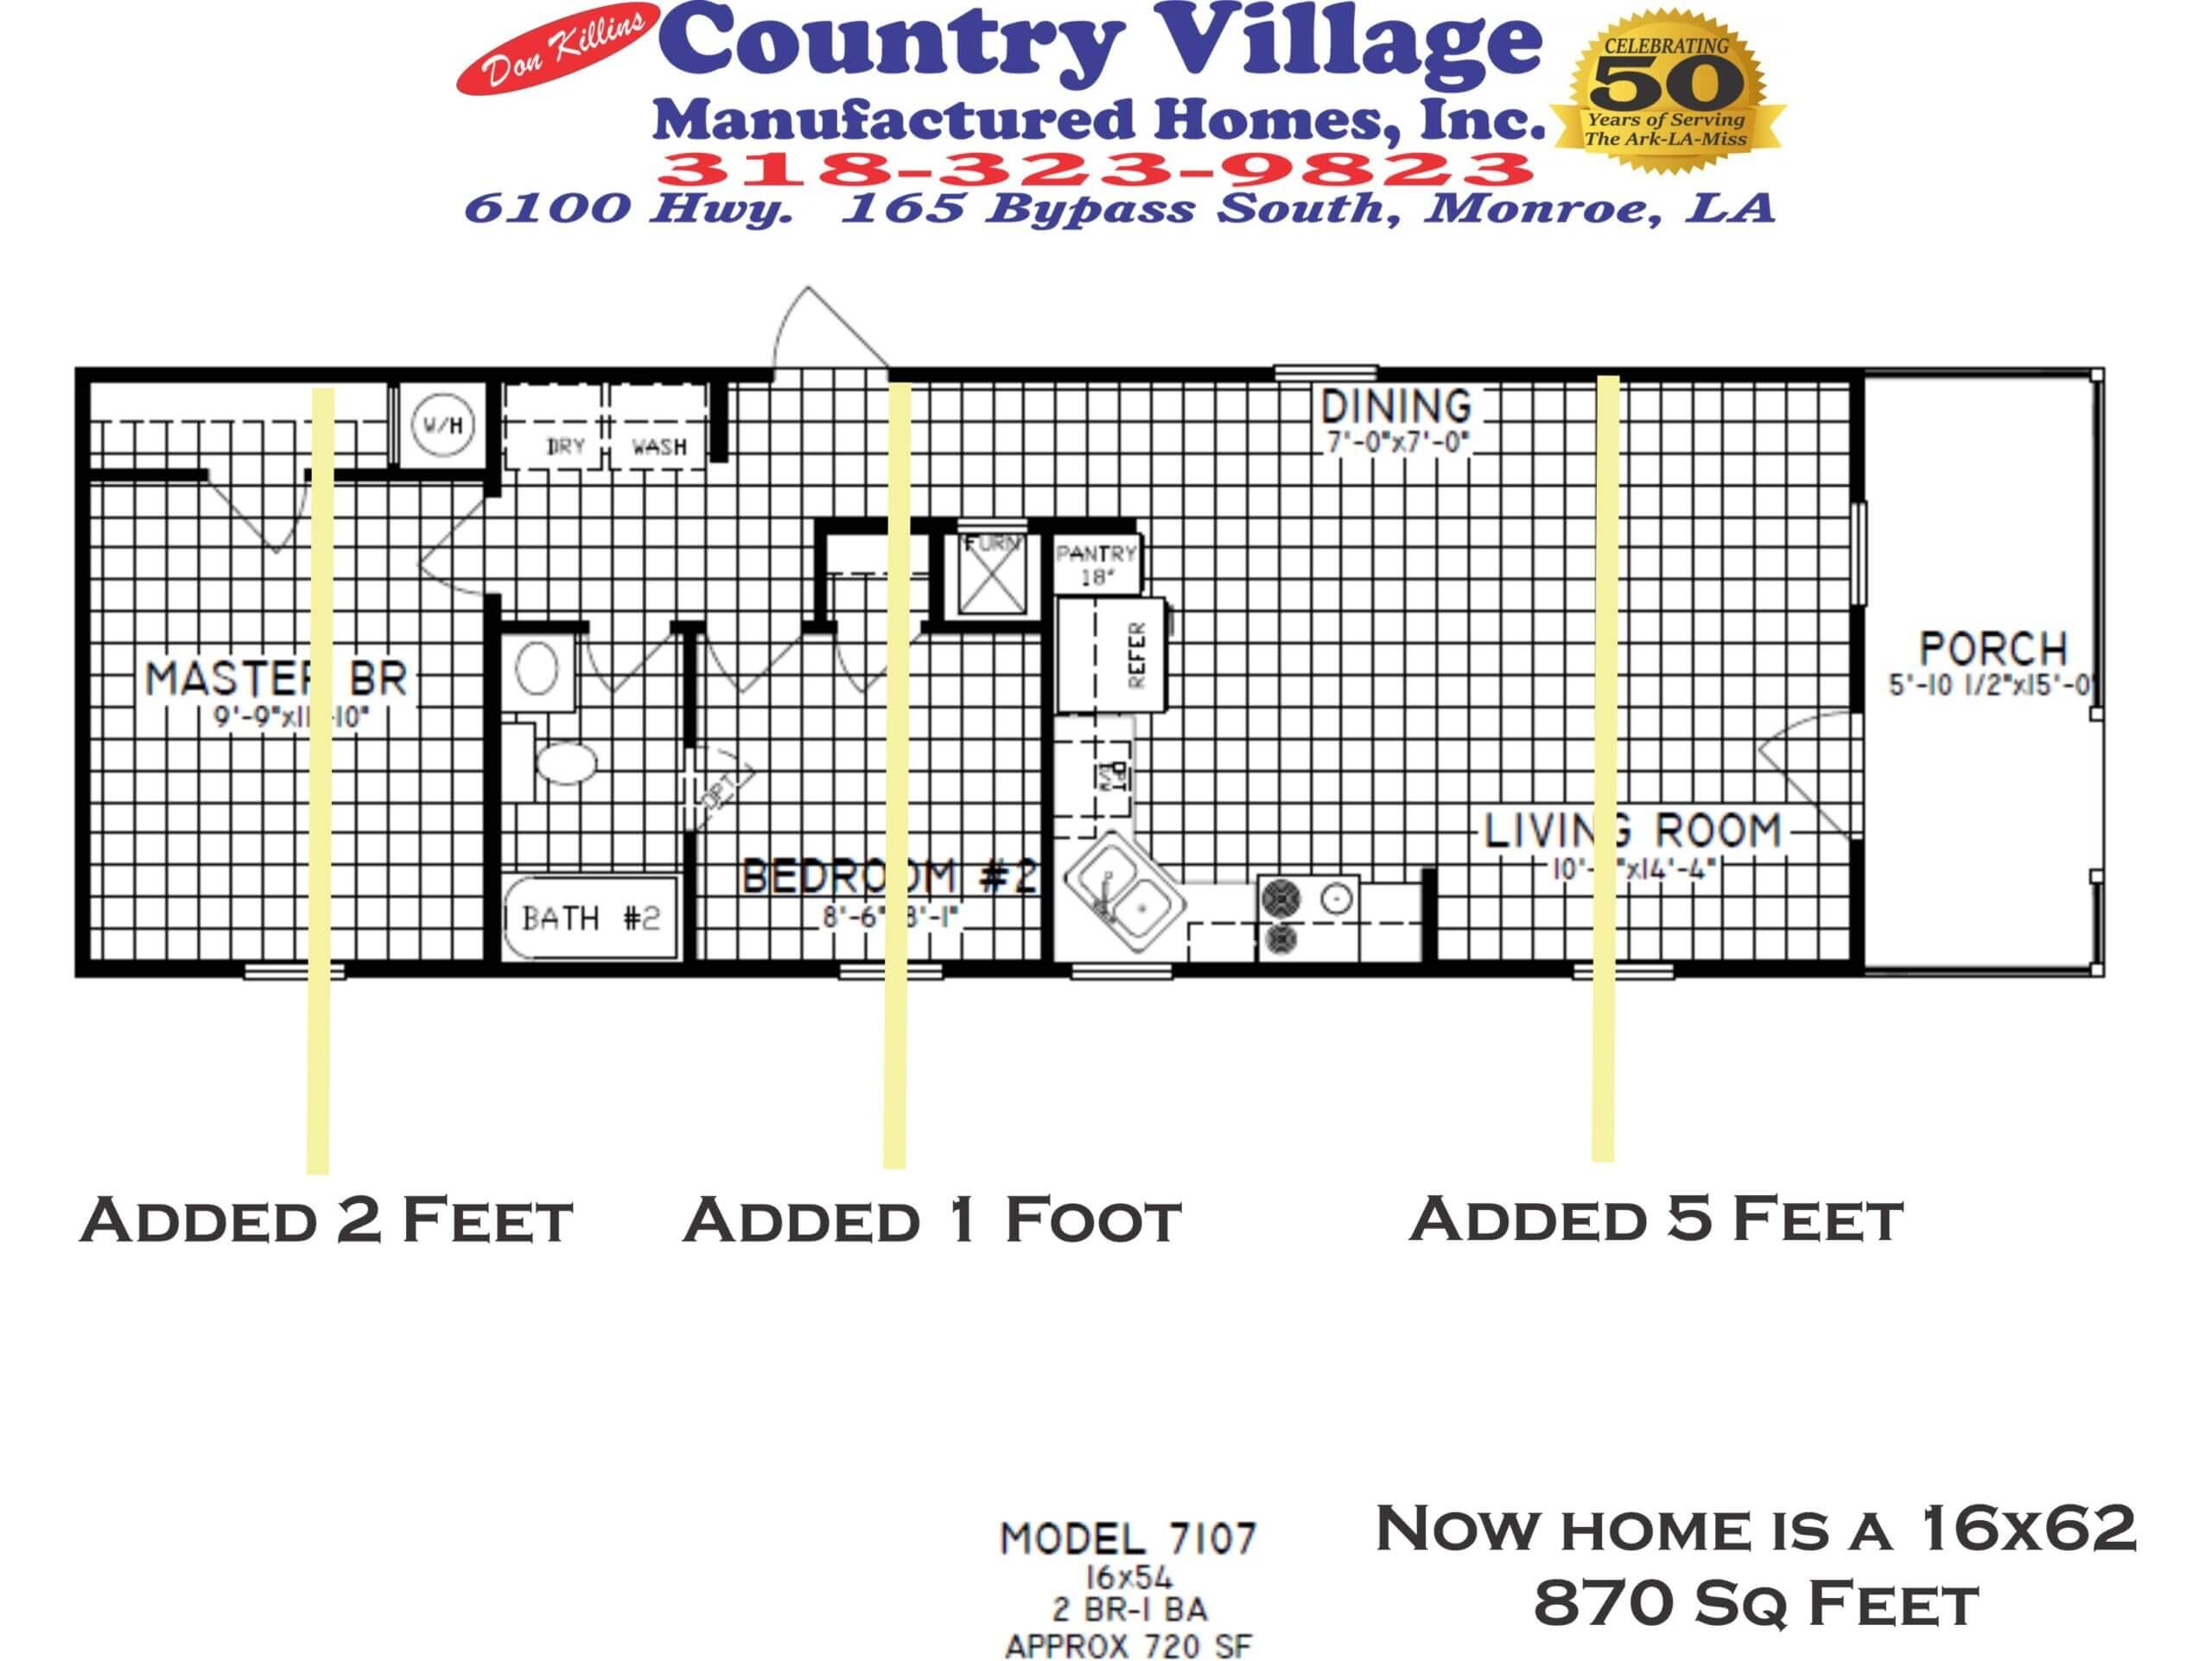 7107 Cottage 16x62 870 sq feet 2+1